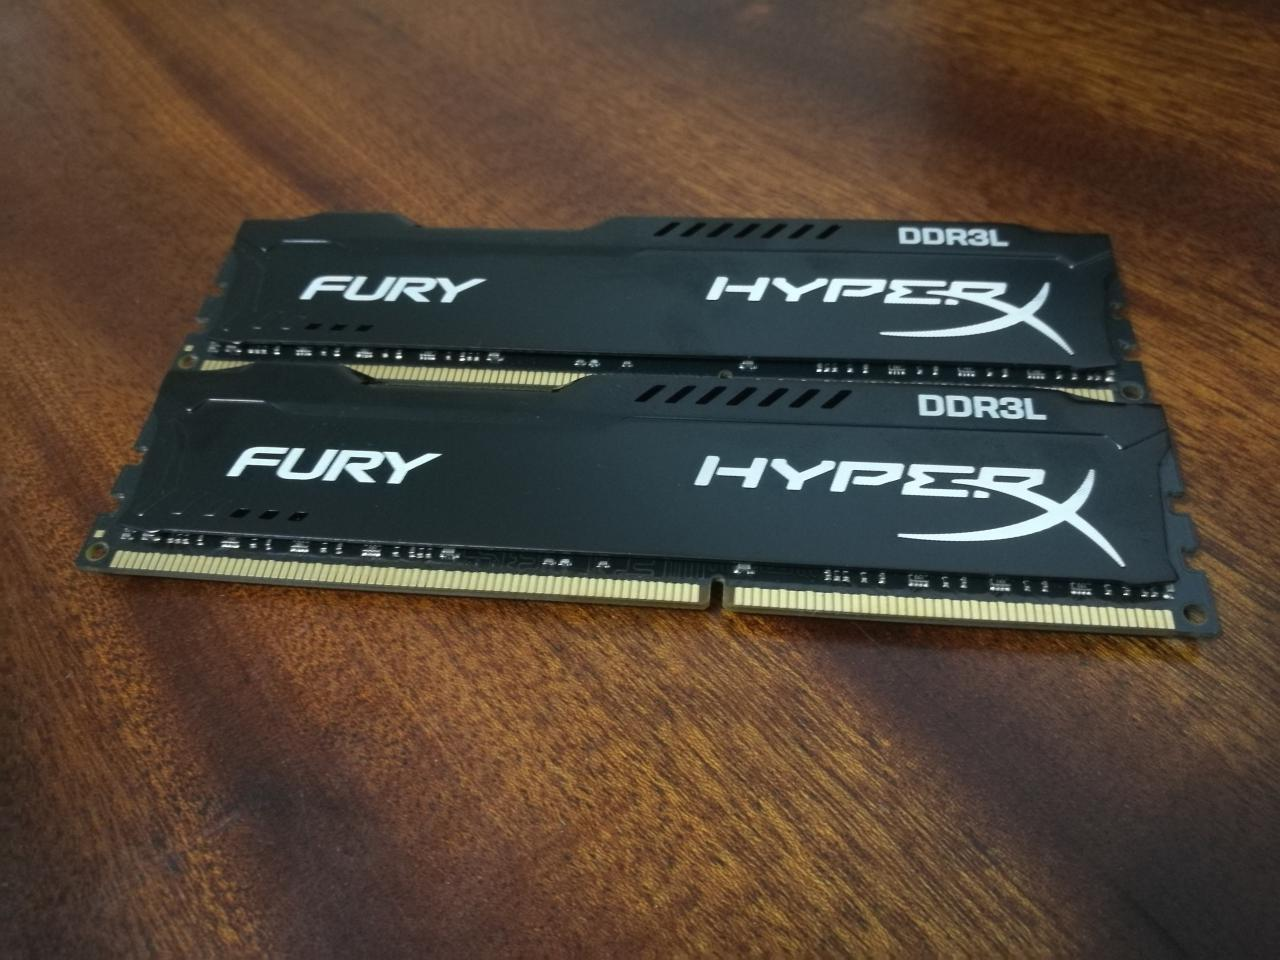 kingston ddr3l 8 - Как сэкономить на оперативной памяти и не проиграть. Обзор HyperX FURY DDR3L